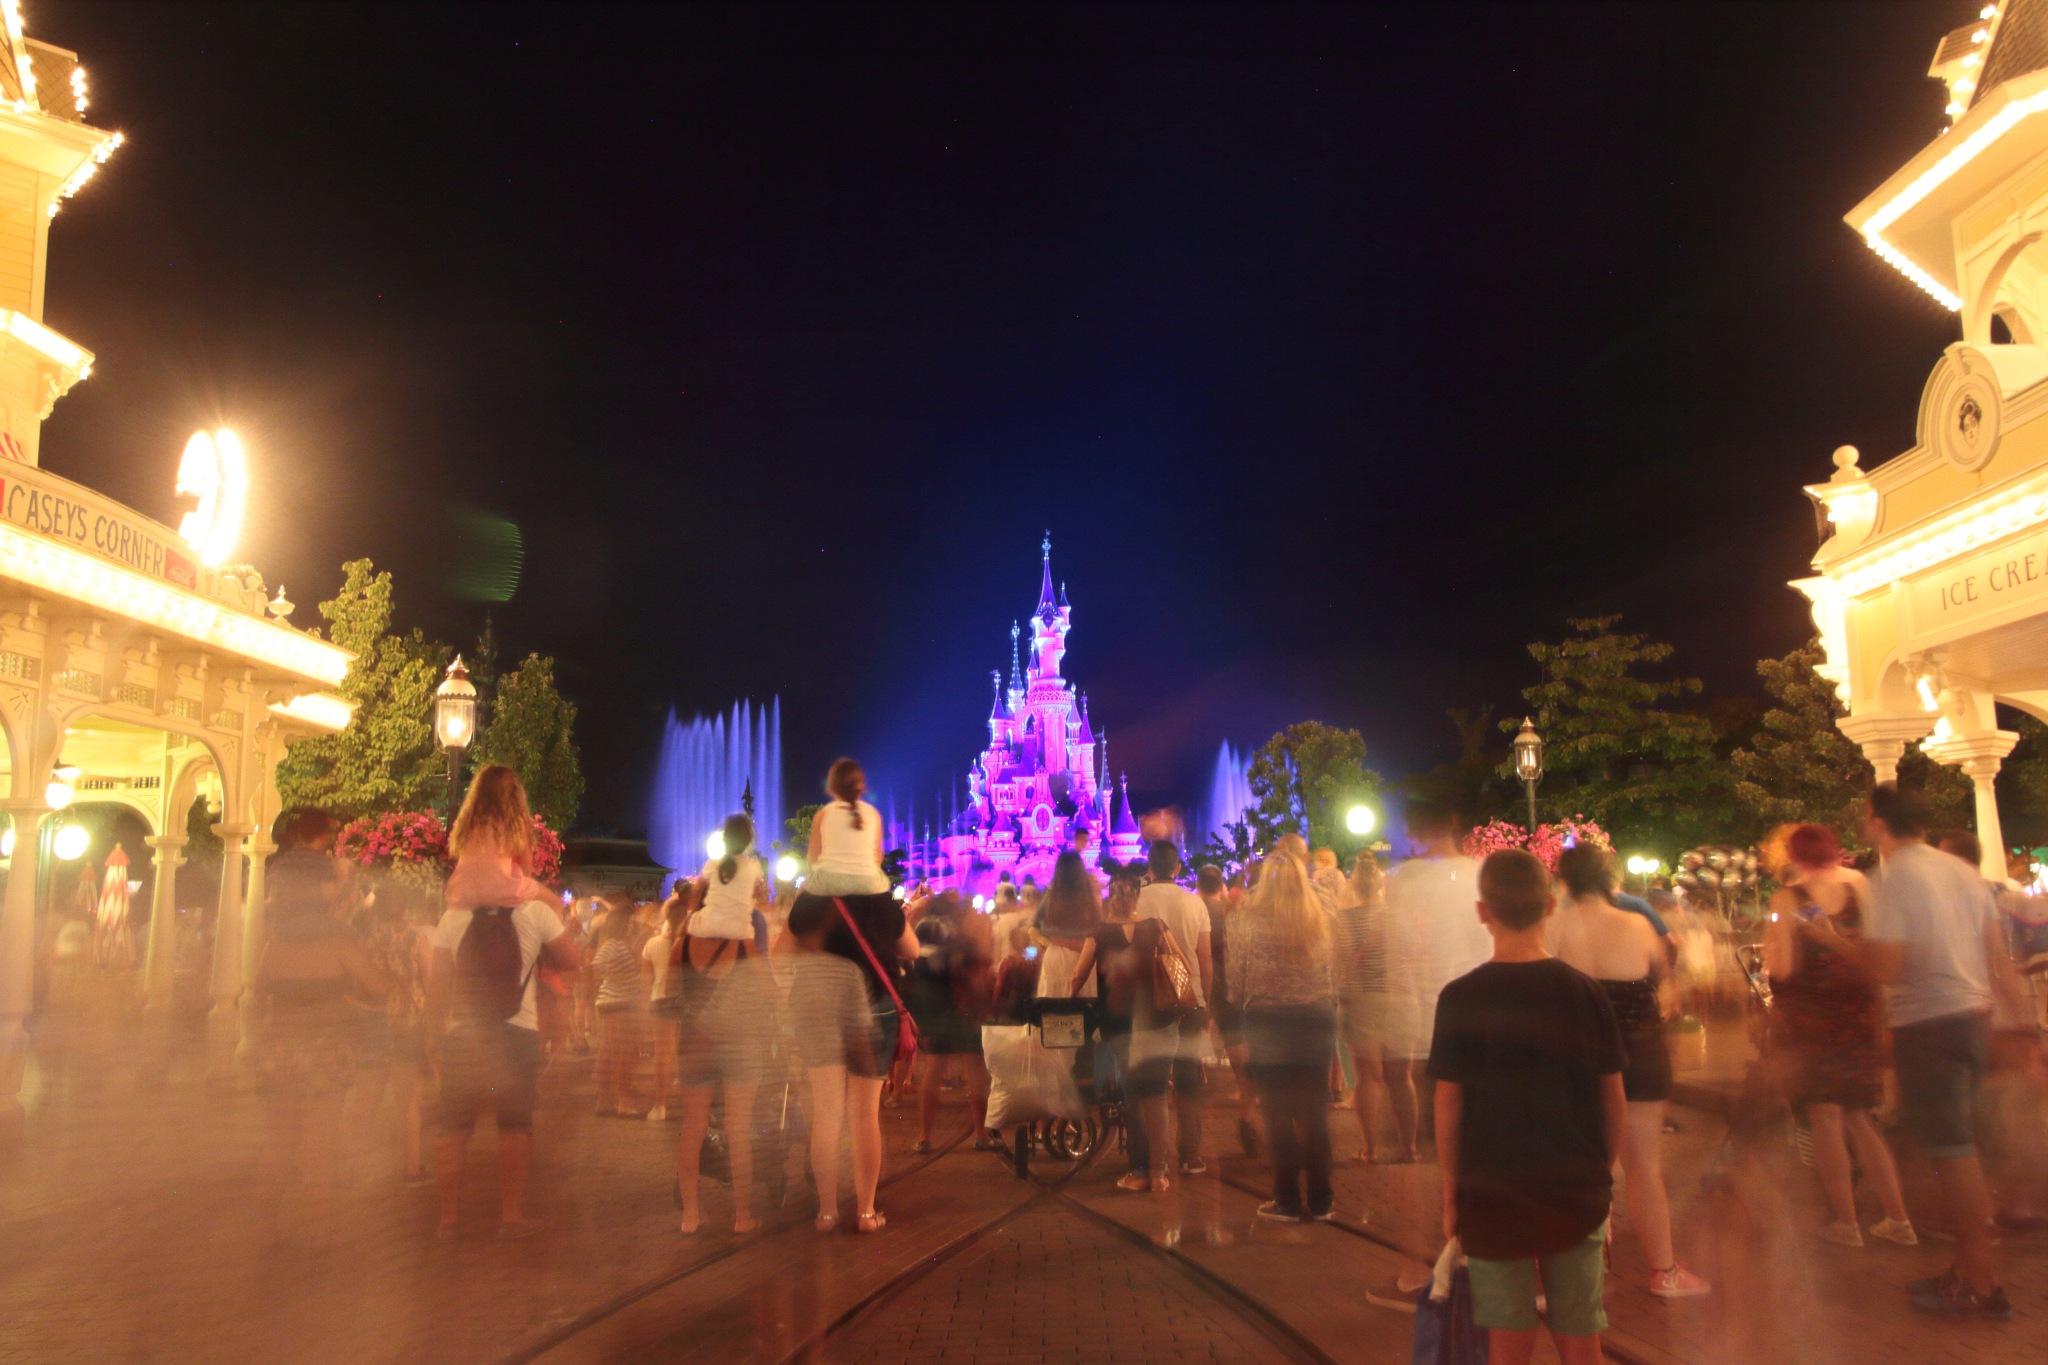 Crowd at euro Disney by Jason Lavine